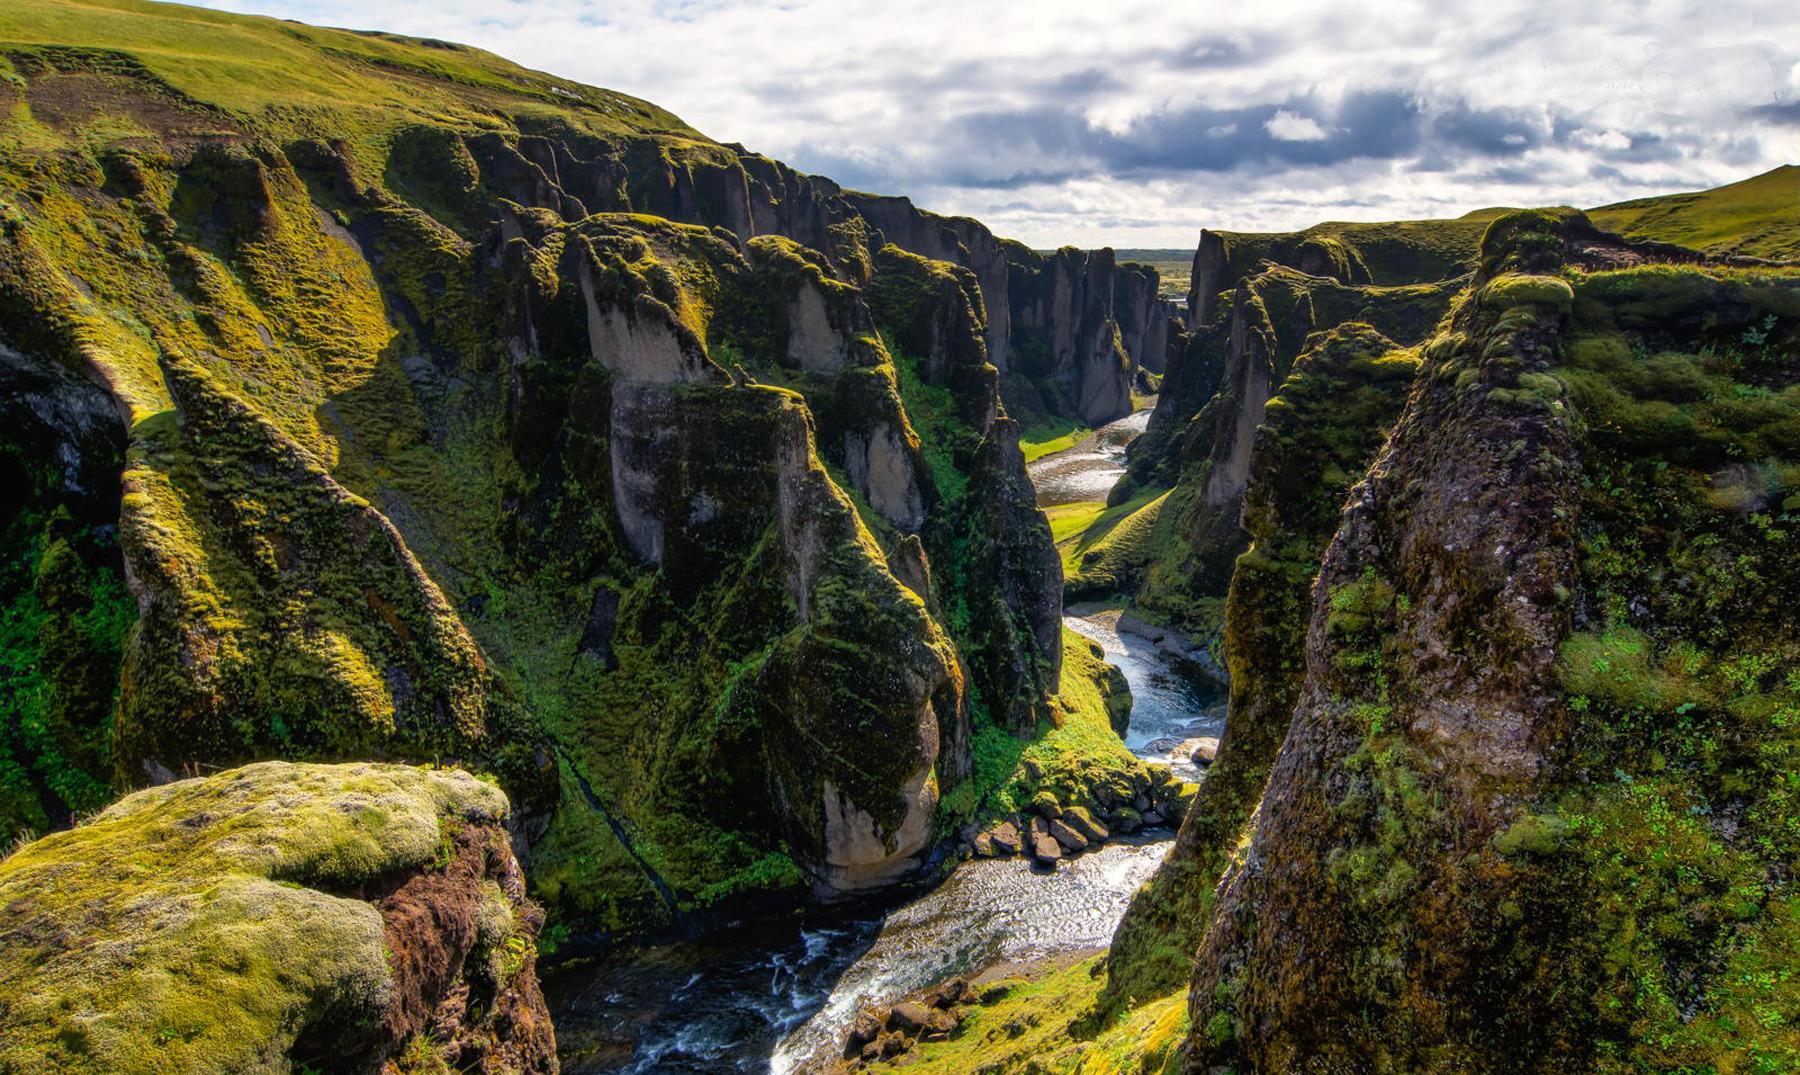 Resultado de imagen para Cañón Fjaðrárgljúfur, Islandia